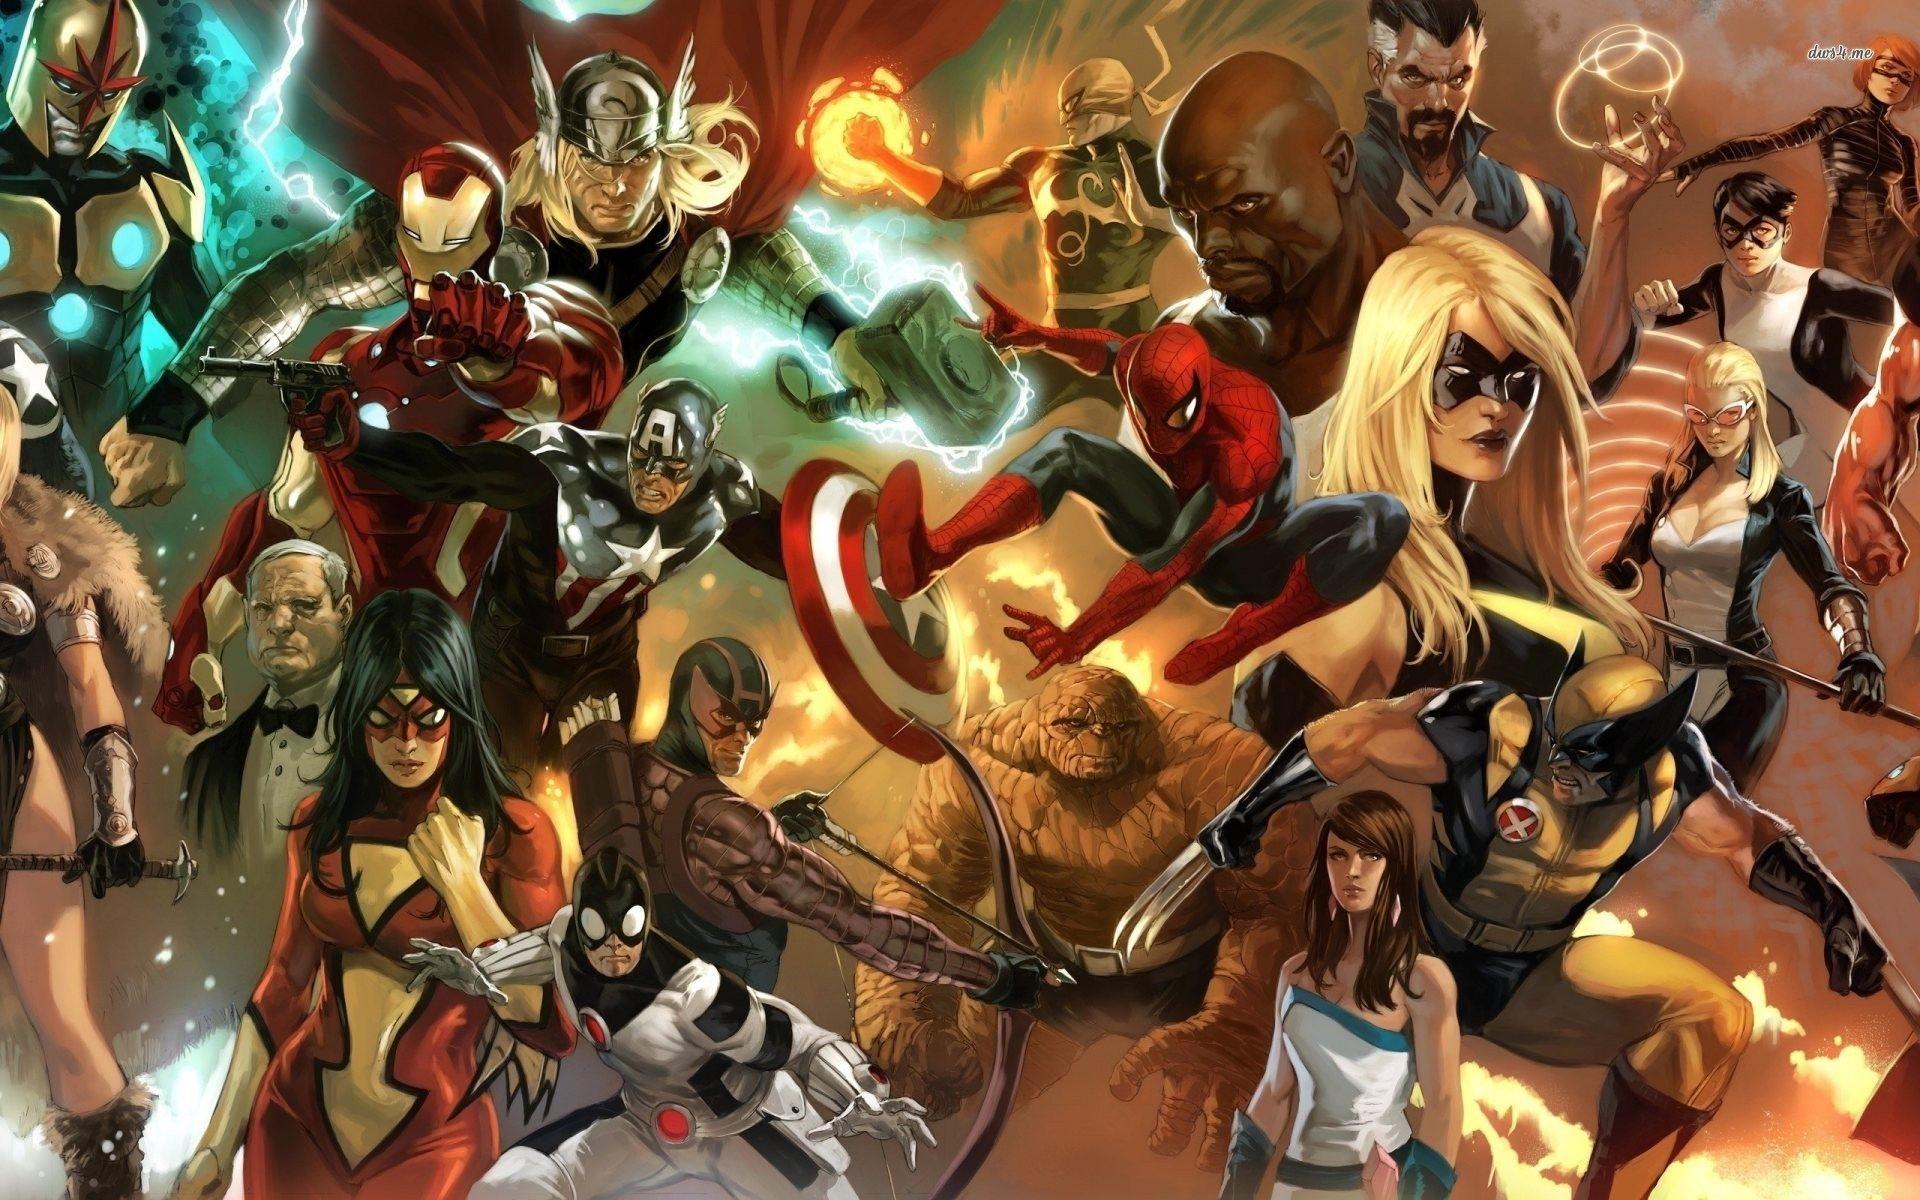 1920x1080 Marvel Superheroes Wallpaper Hd